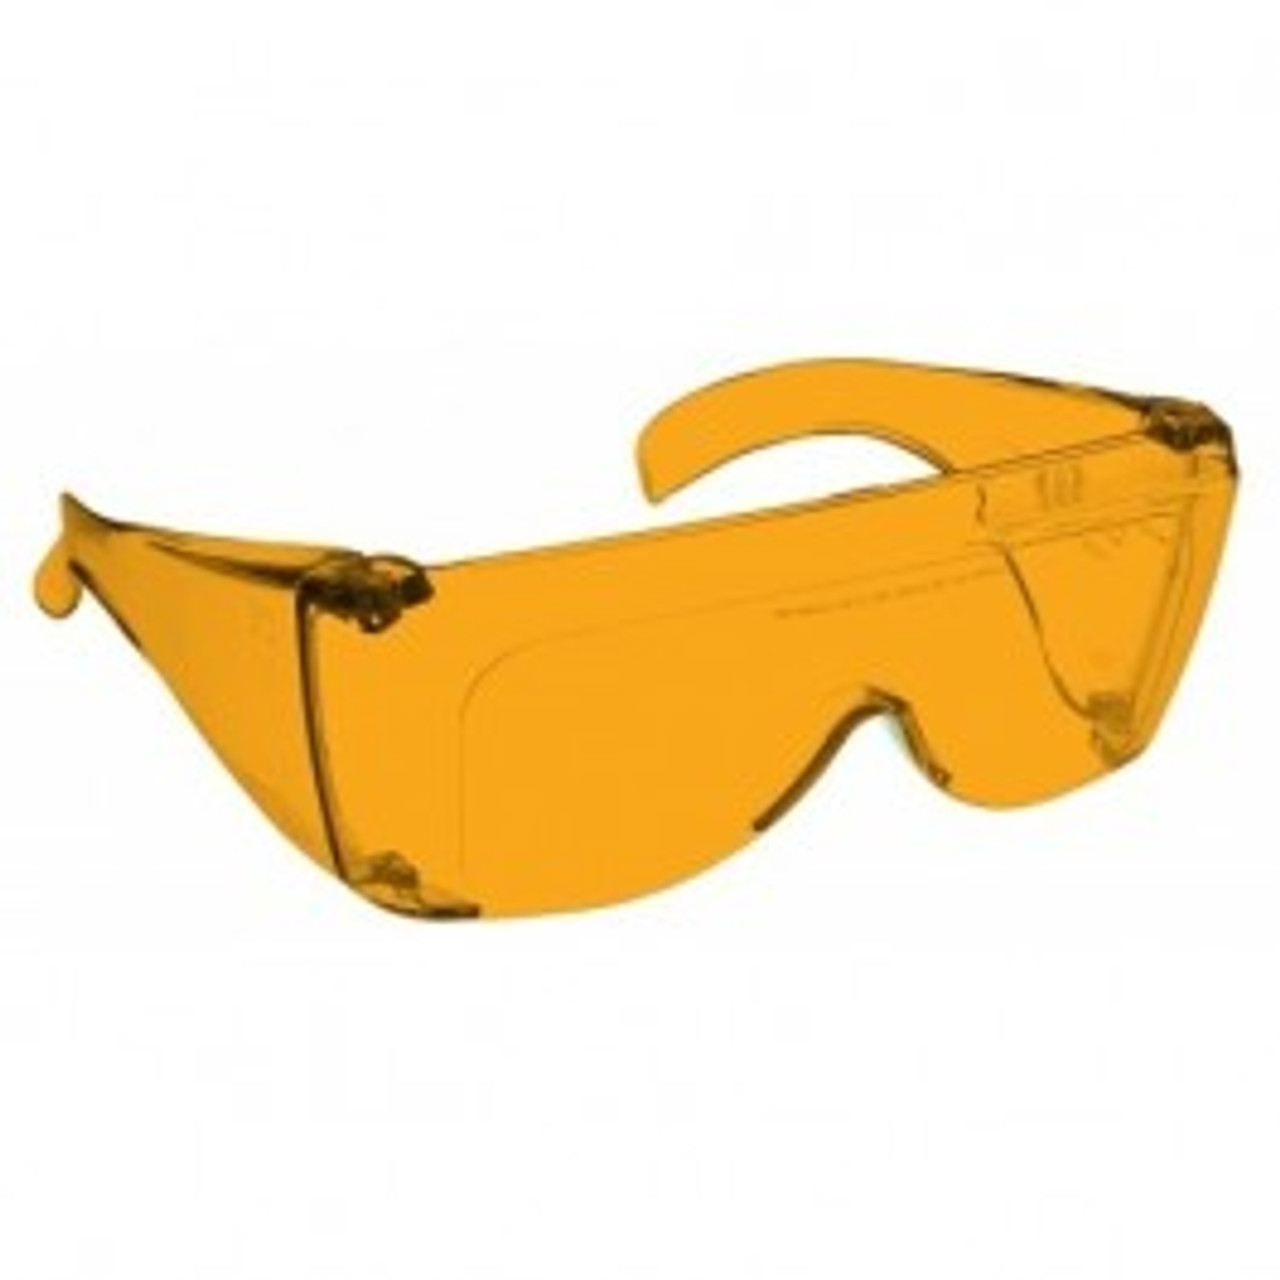 NoIR 48% Orange Fitover Sunglasses Large L60